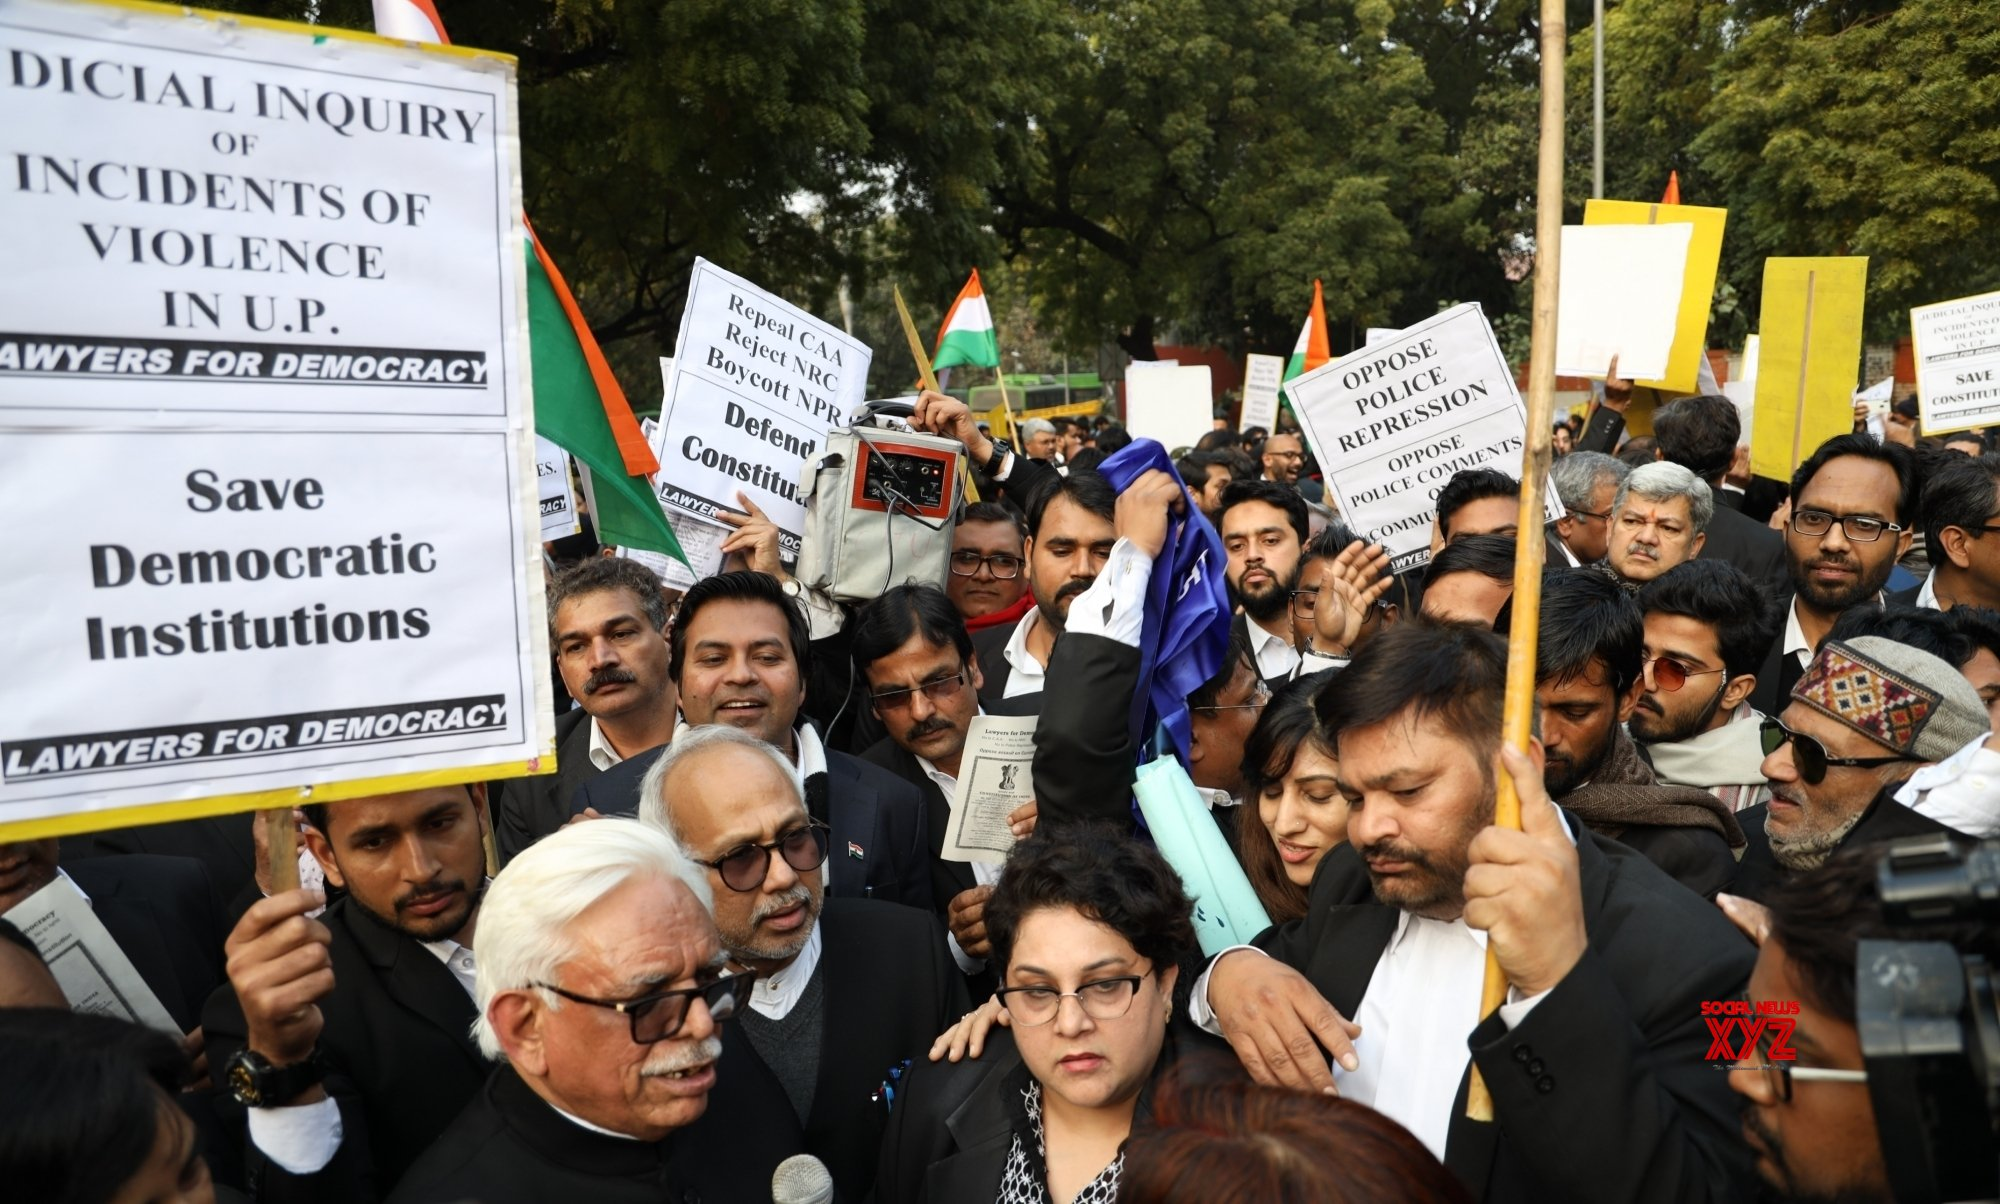 New Delhi: Lawyers protest against CAA - NRC - NPR #Gallery